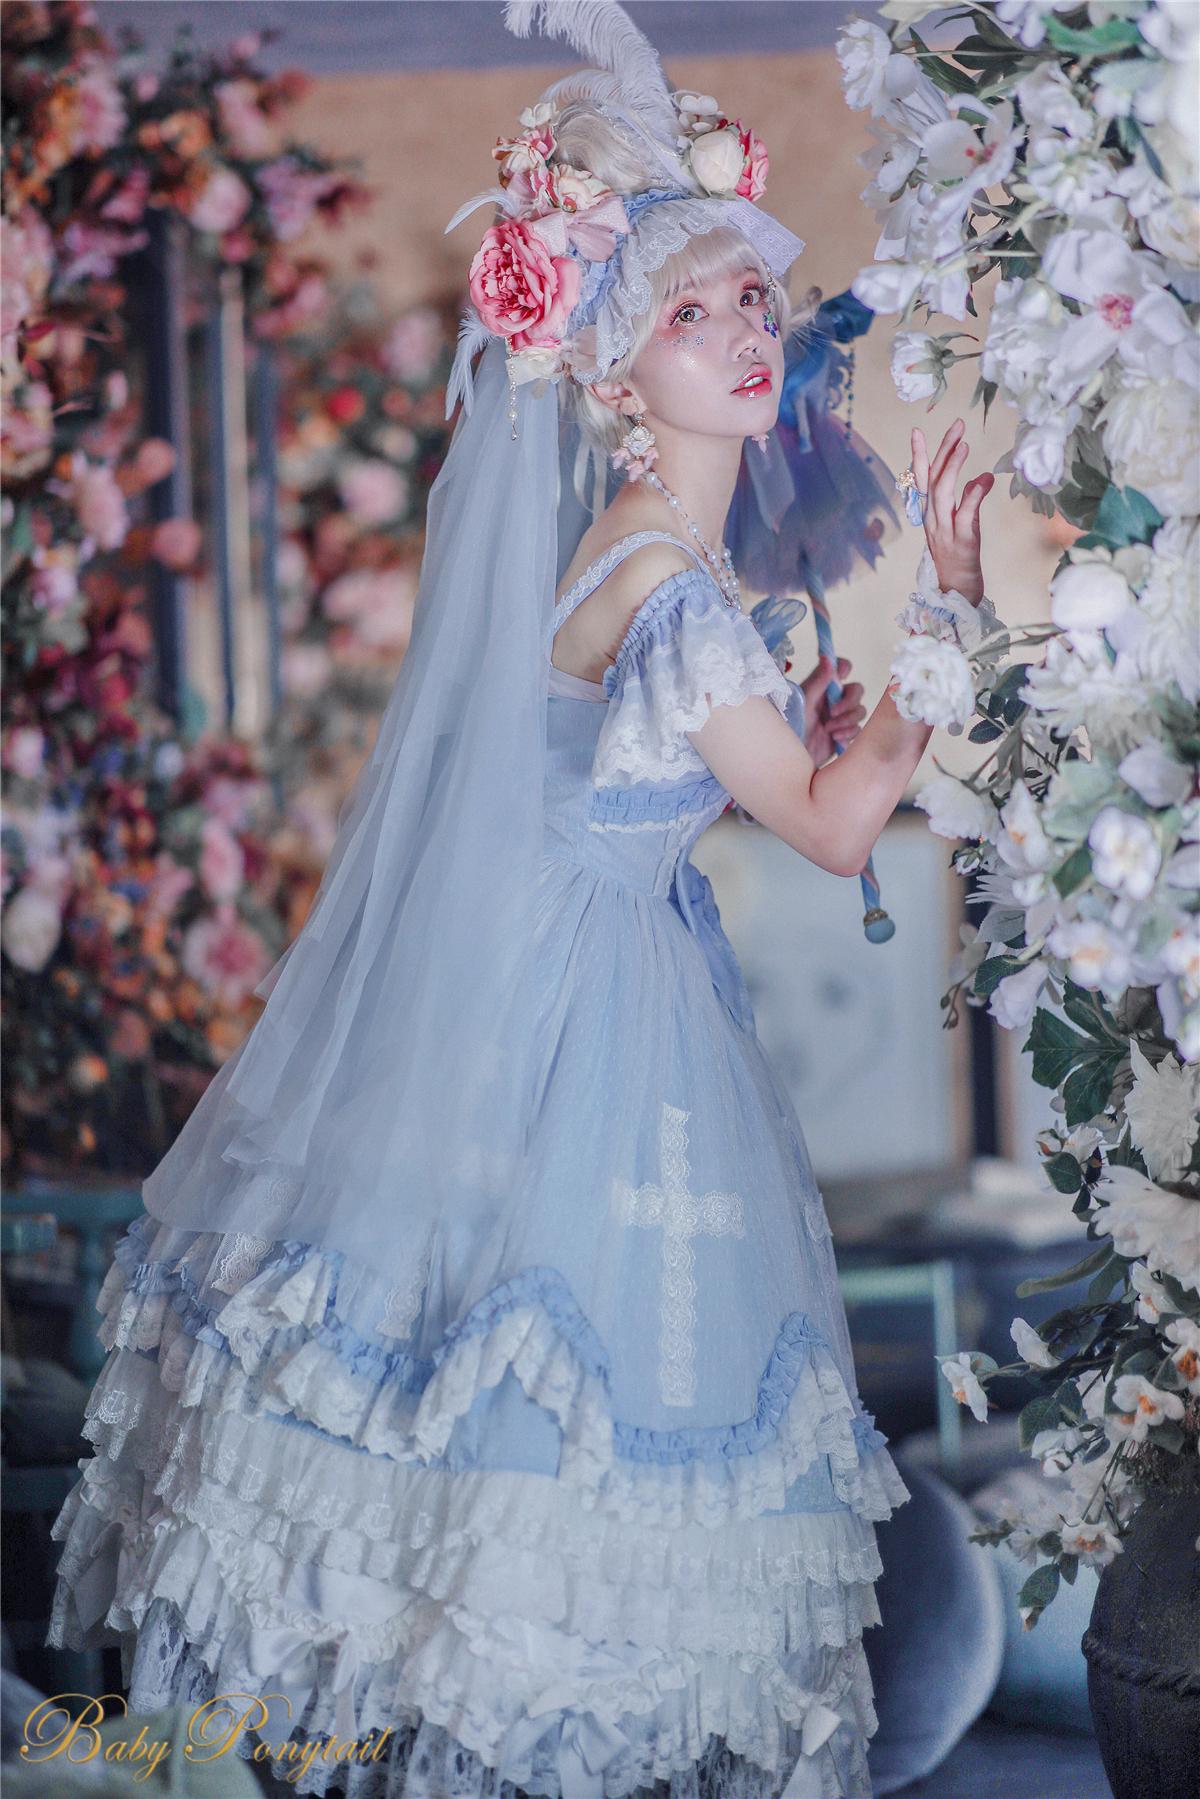 Babyponytail_Heavenly Teardrops_Model photo_JSK SAX_KAKA_07.jpg